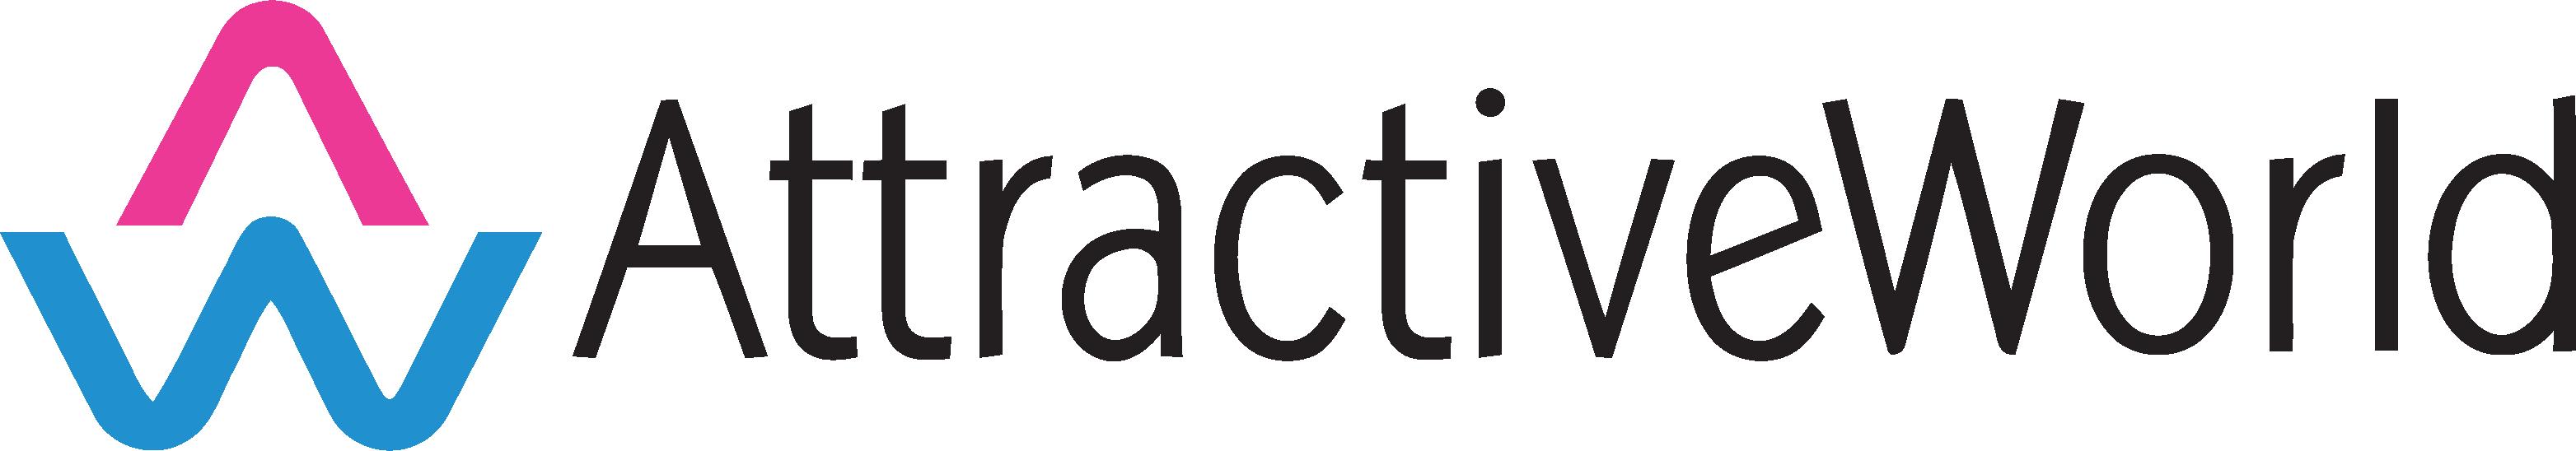 attractiveworld-logo